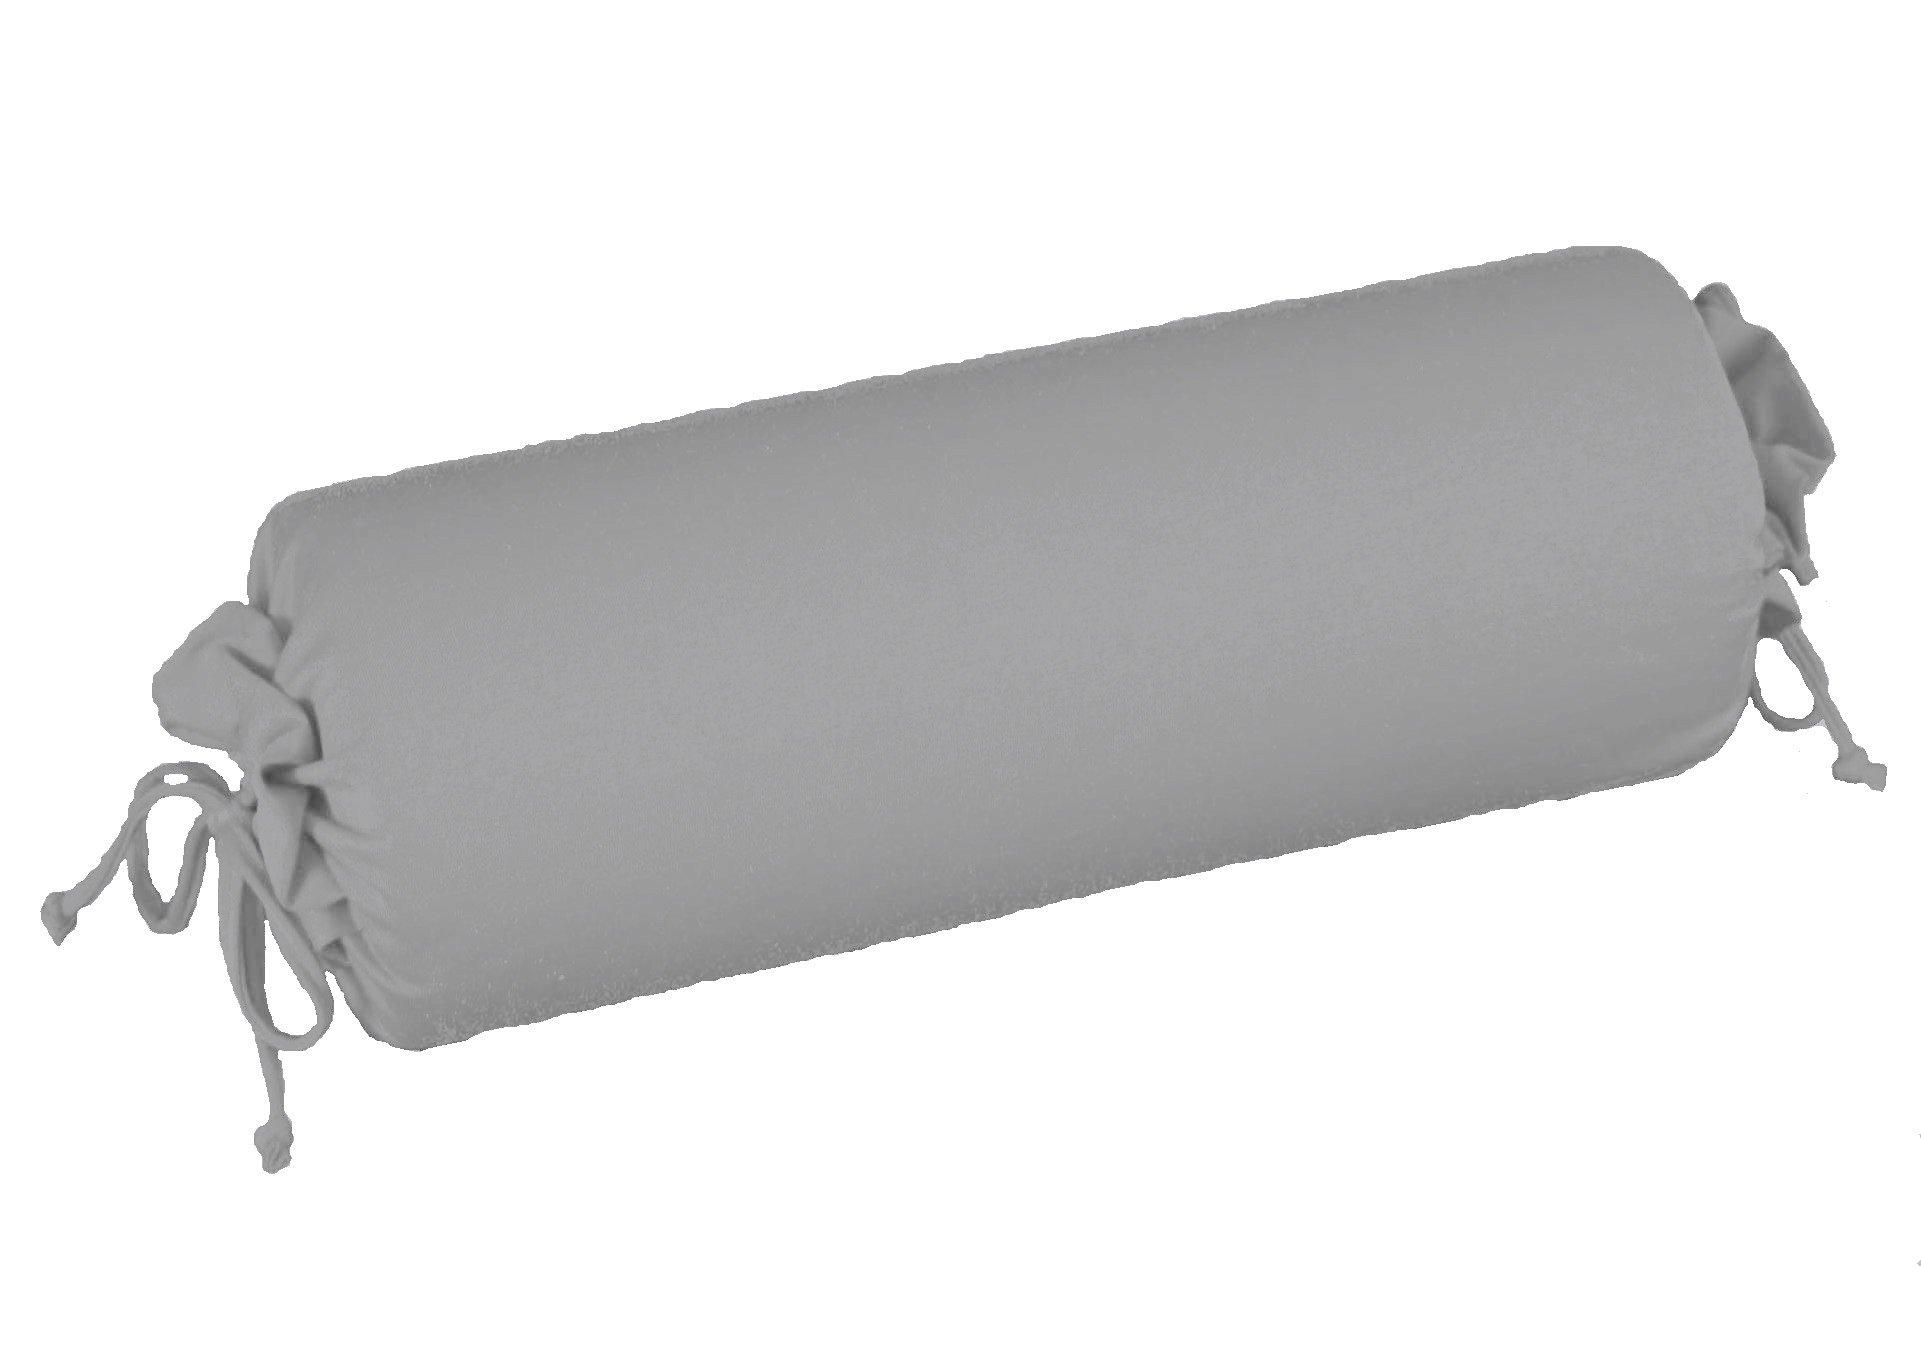 Edel-Zwirn-Jersey platin B15cm